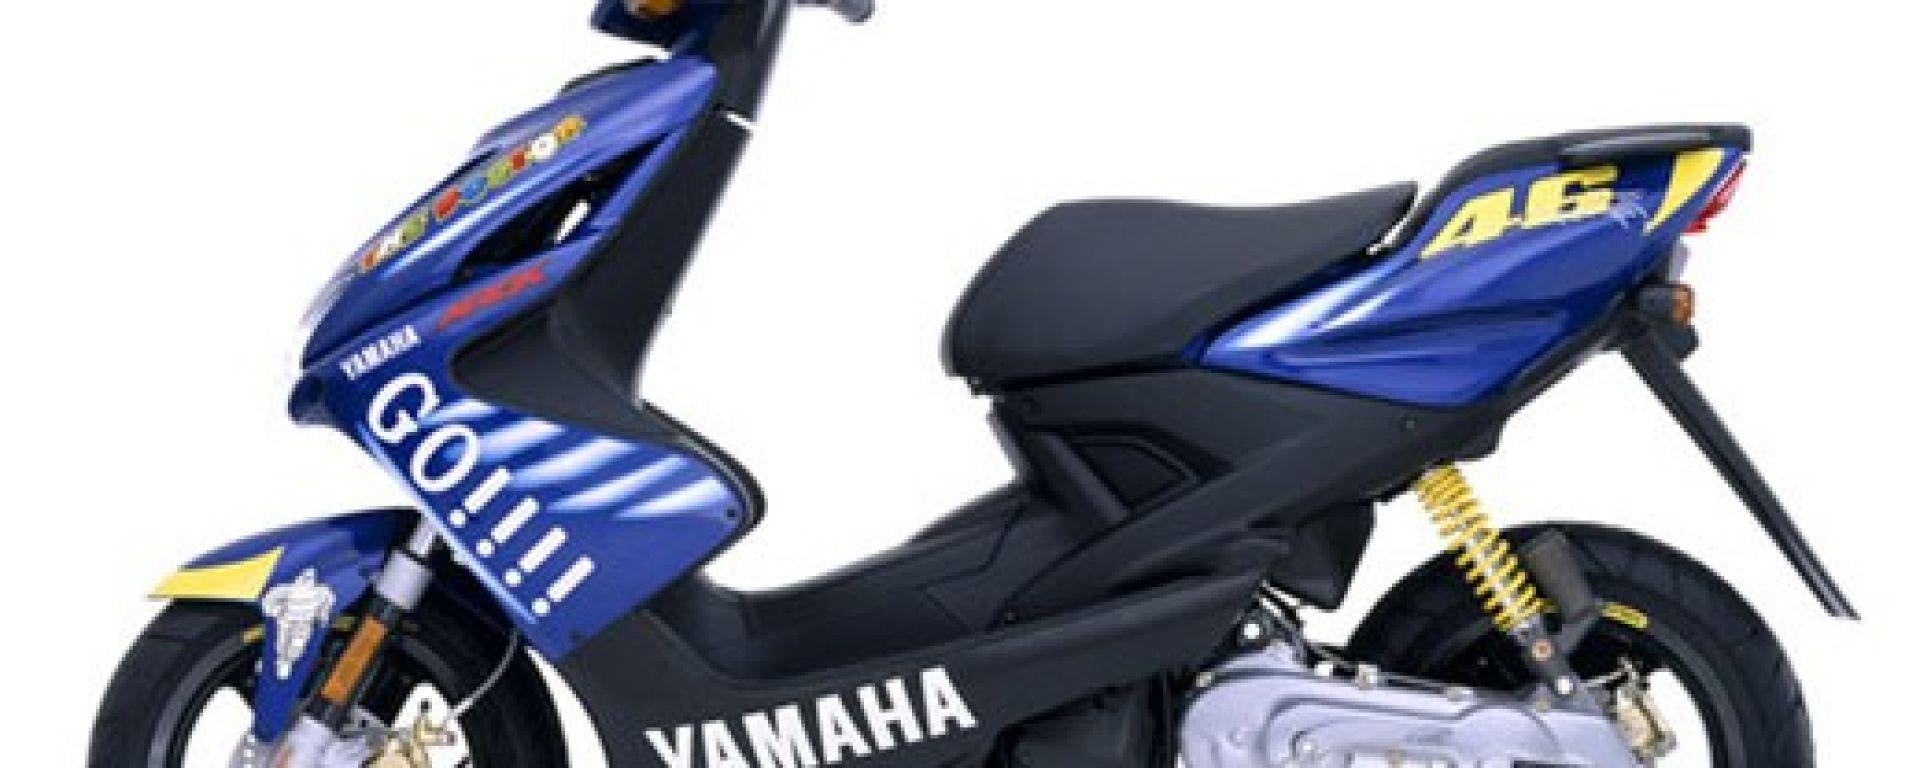 Yamaha Aerox Rossi Replica